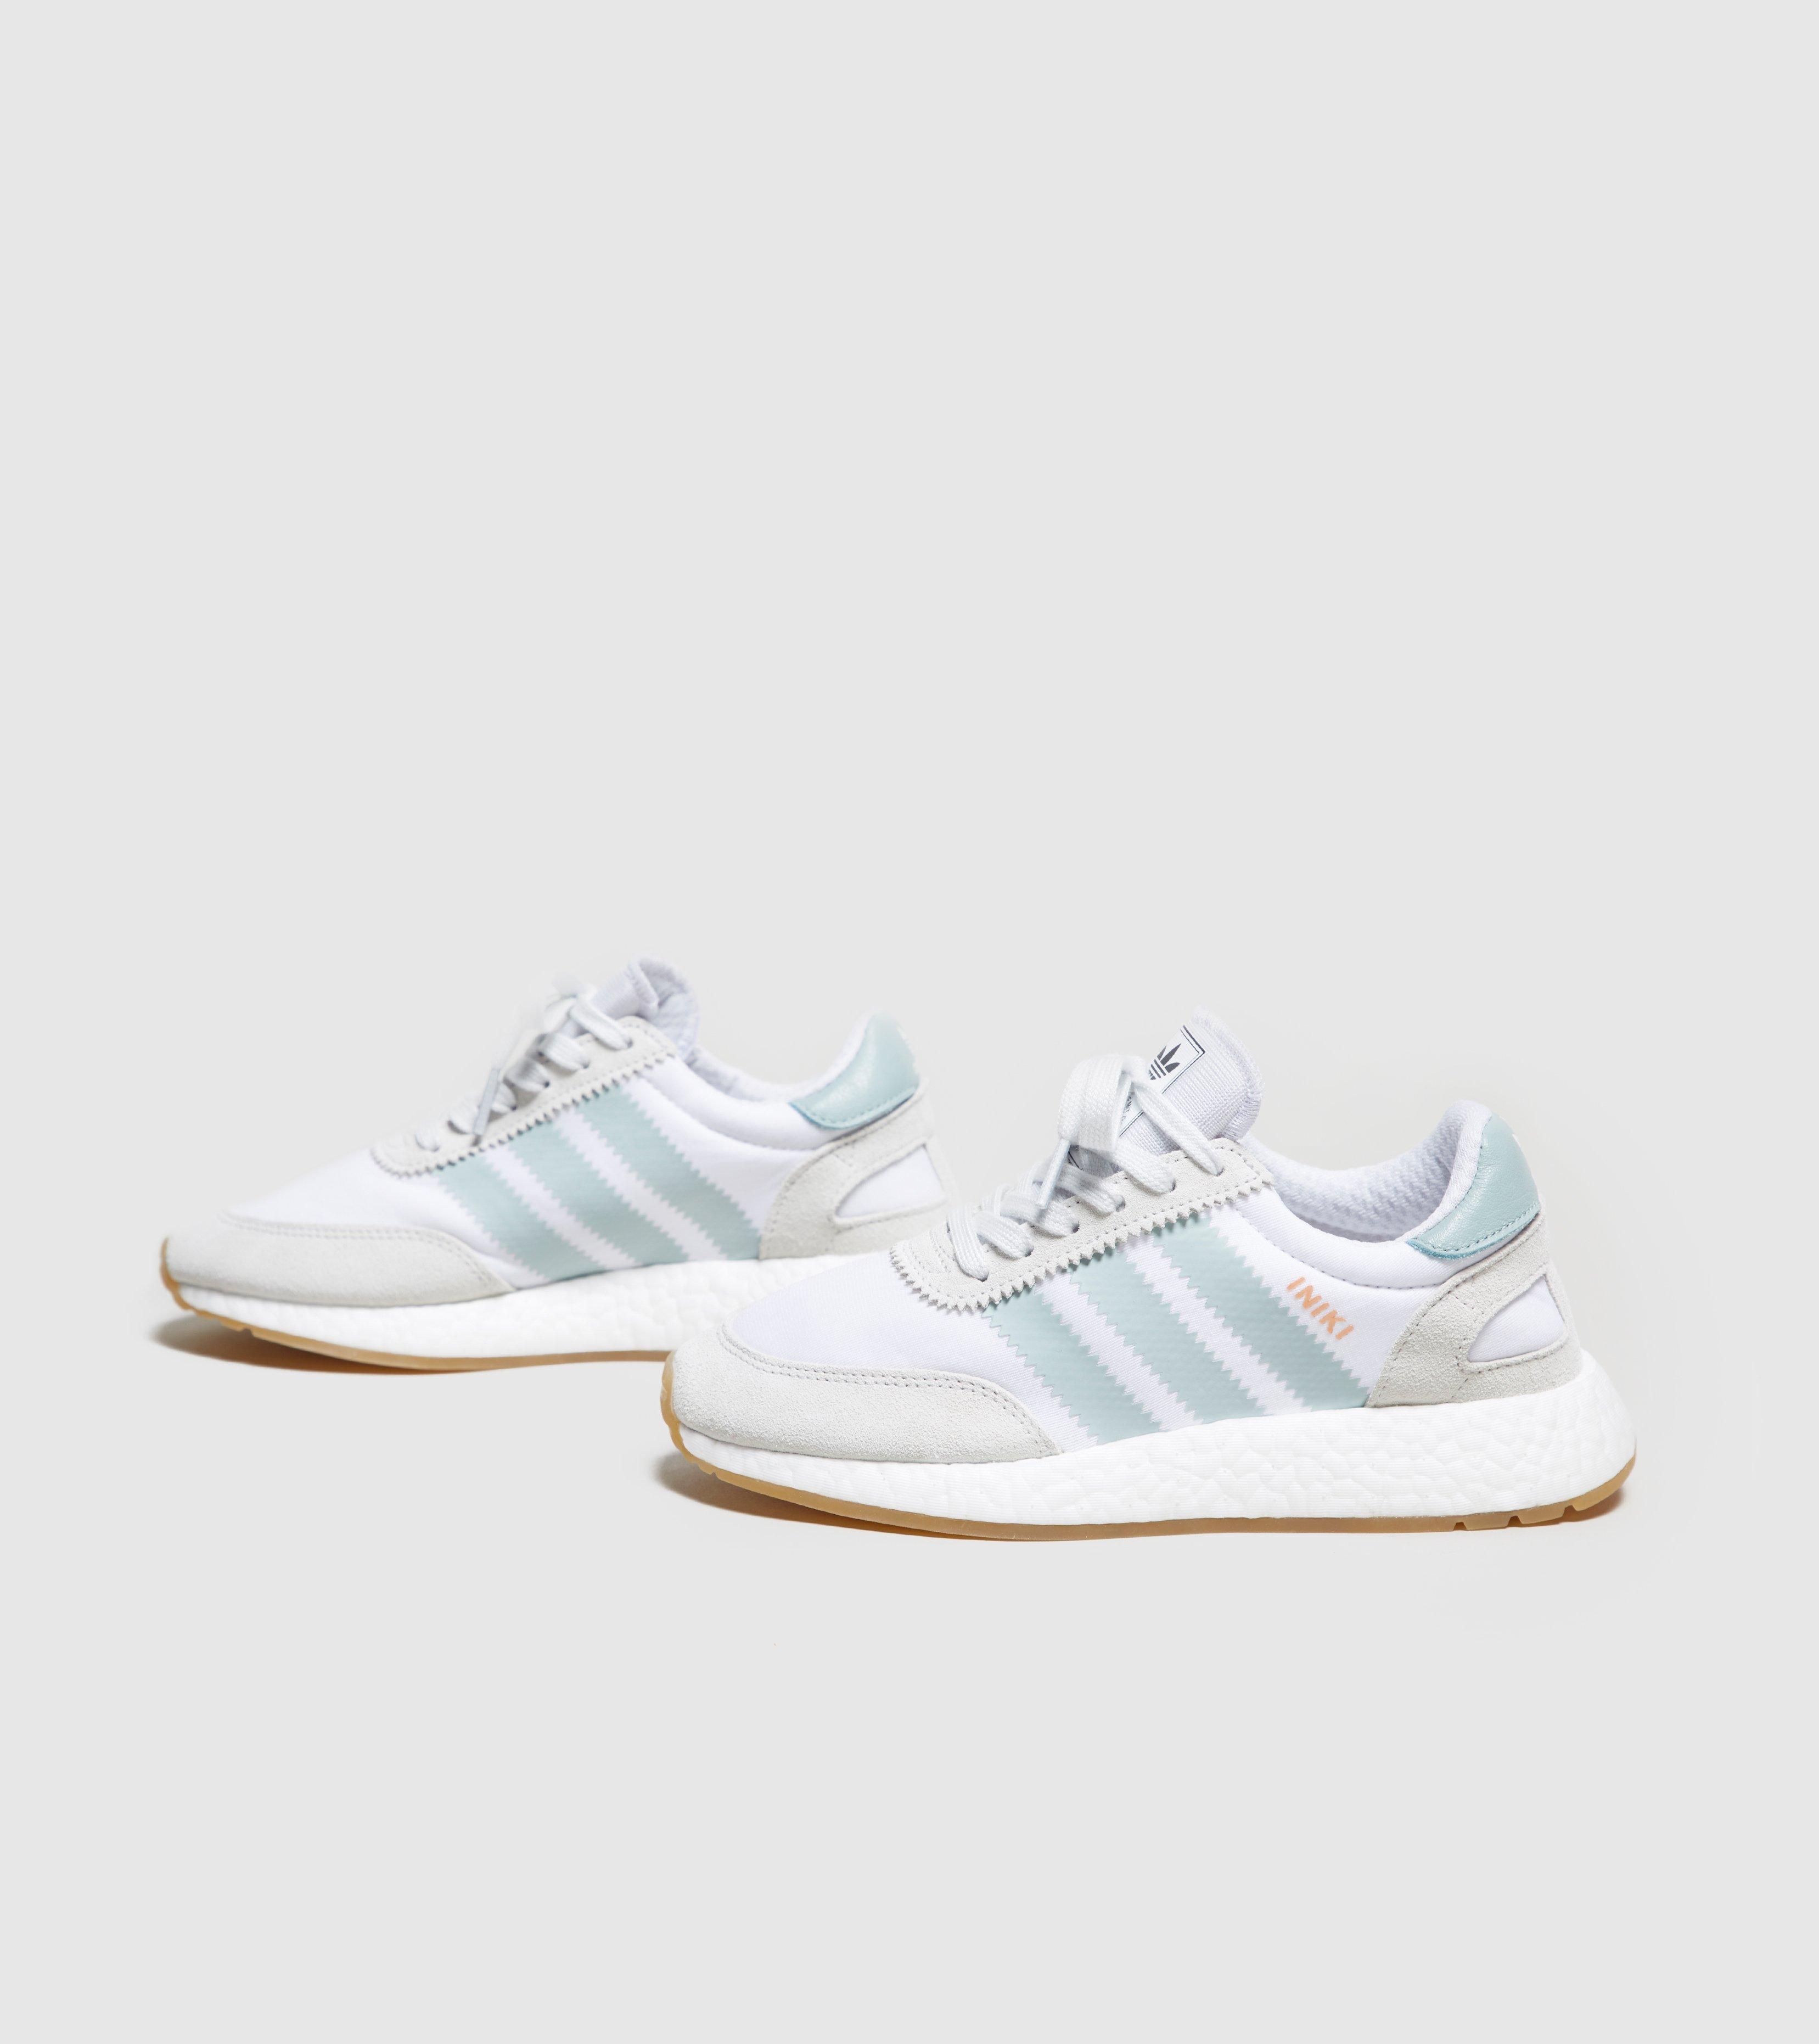 Adidas Originali Iniki Staffetta Donne In Bianco Lyst